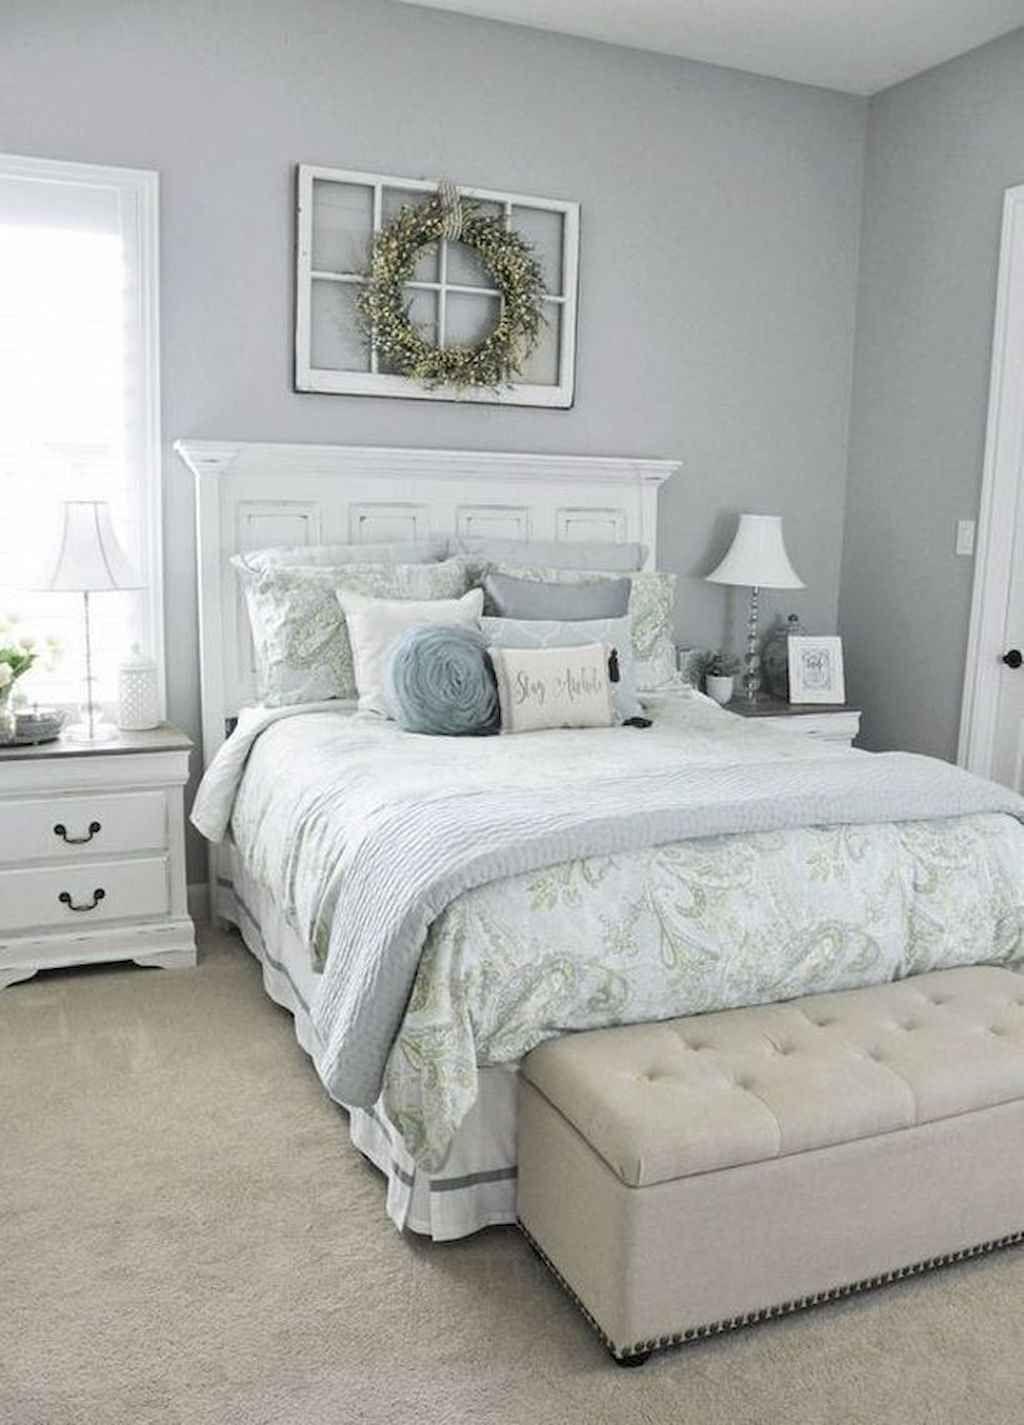 28 beautiful small master bedroom ideas - spaciroom.com in ...